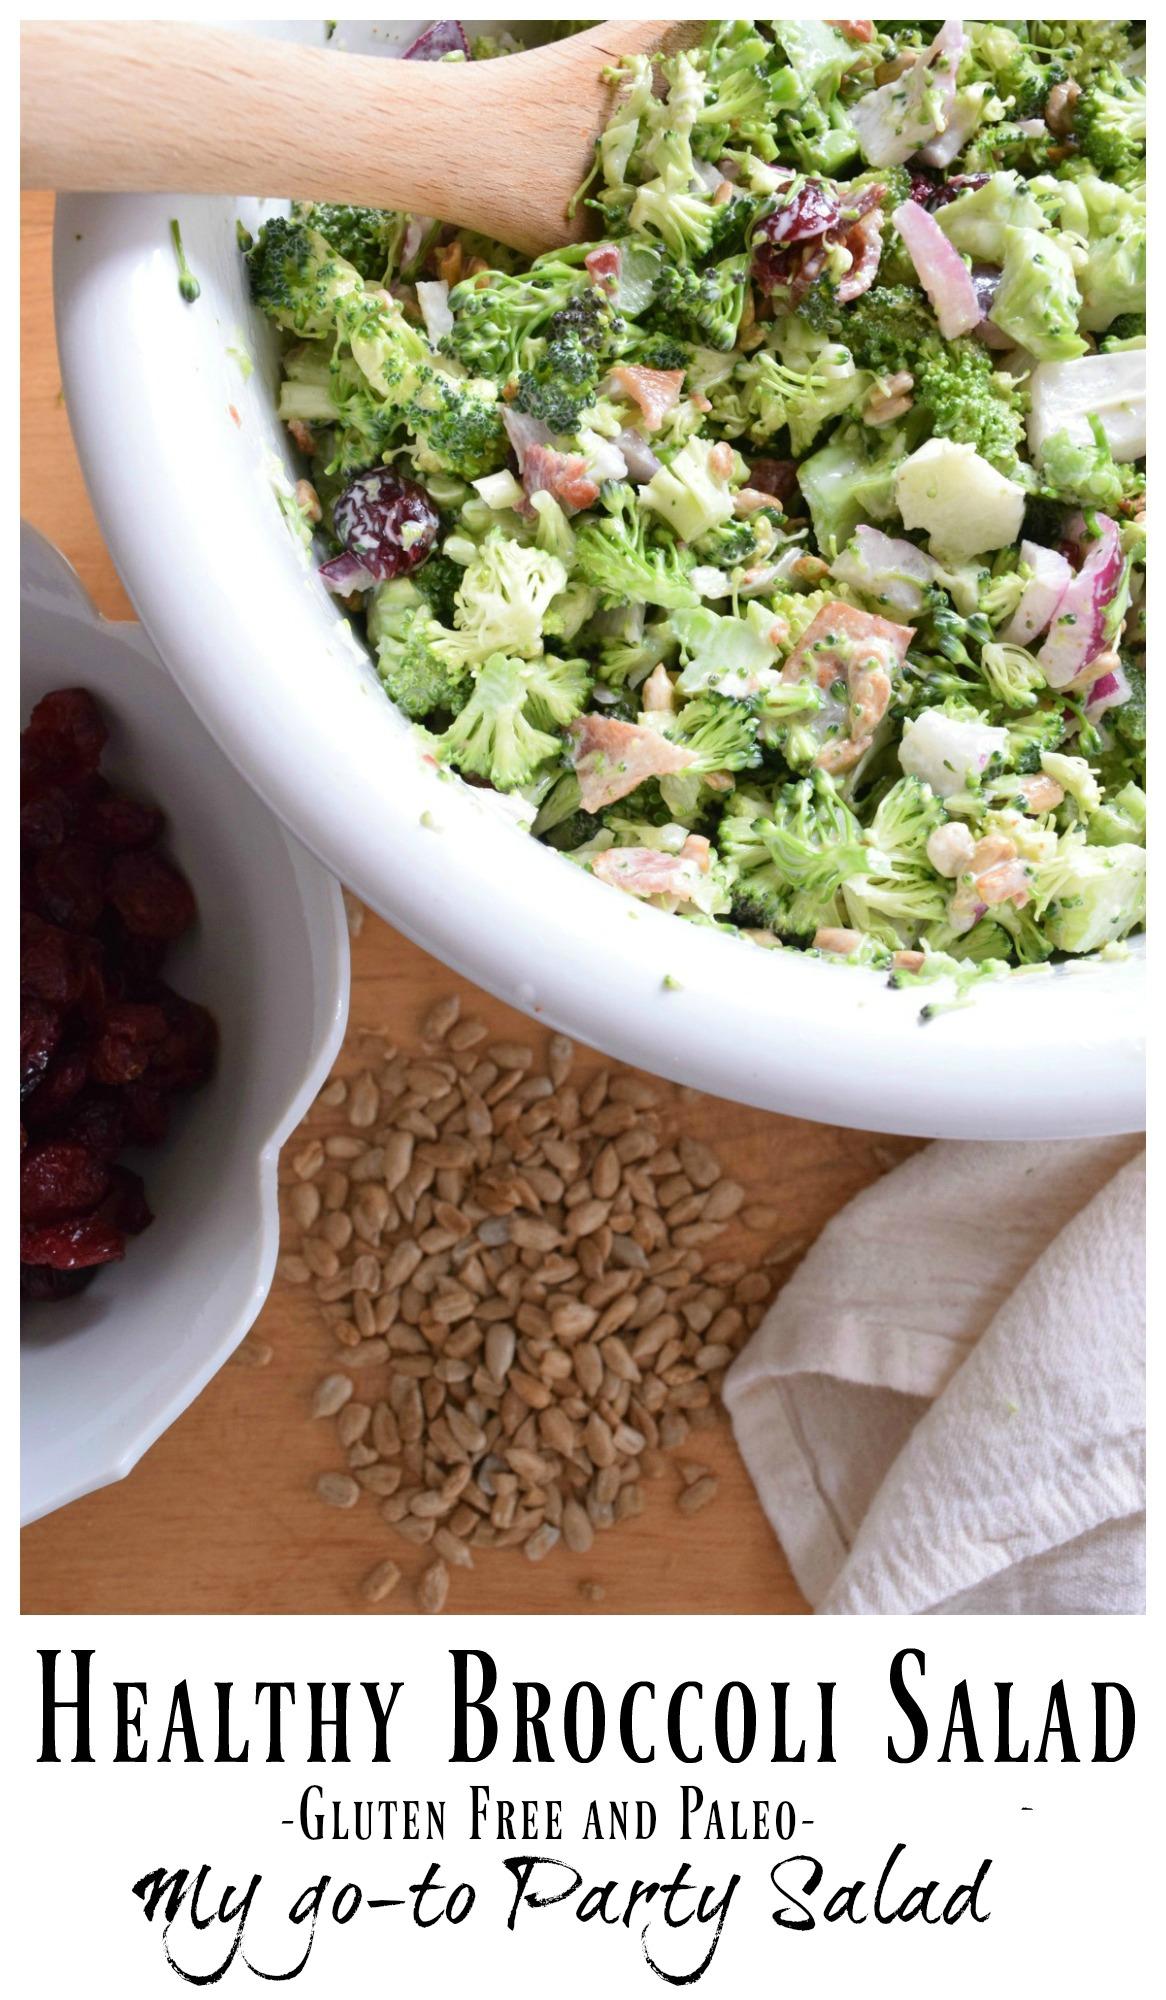 Broccoli Salad- Best Side Salad- Paleo and Gluten Free